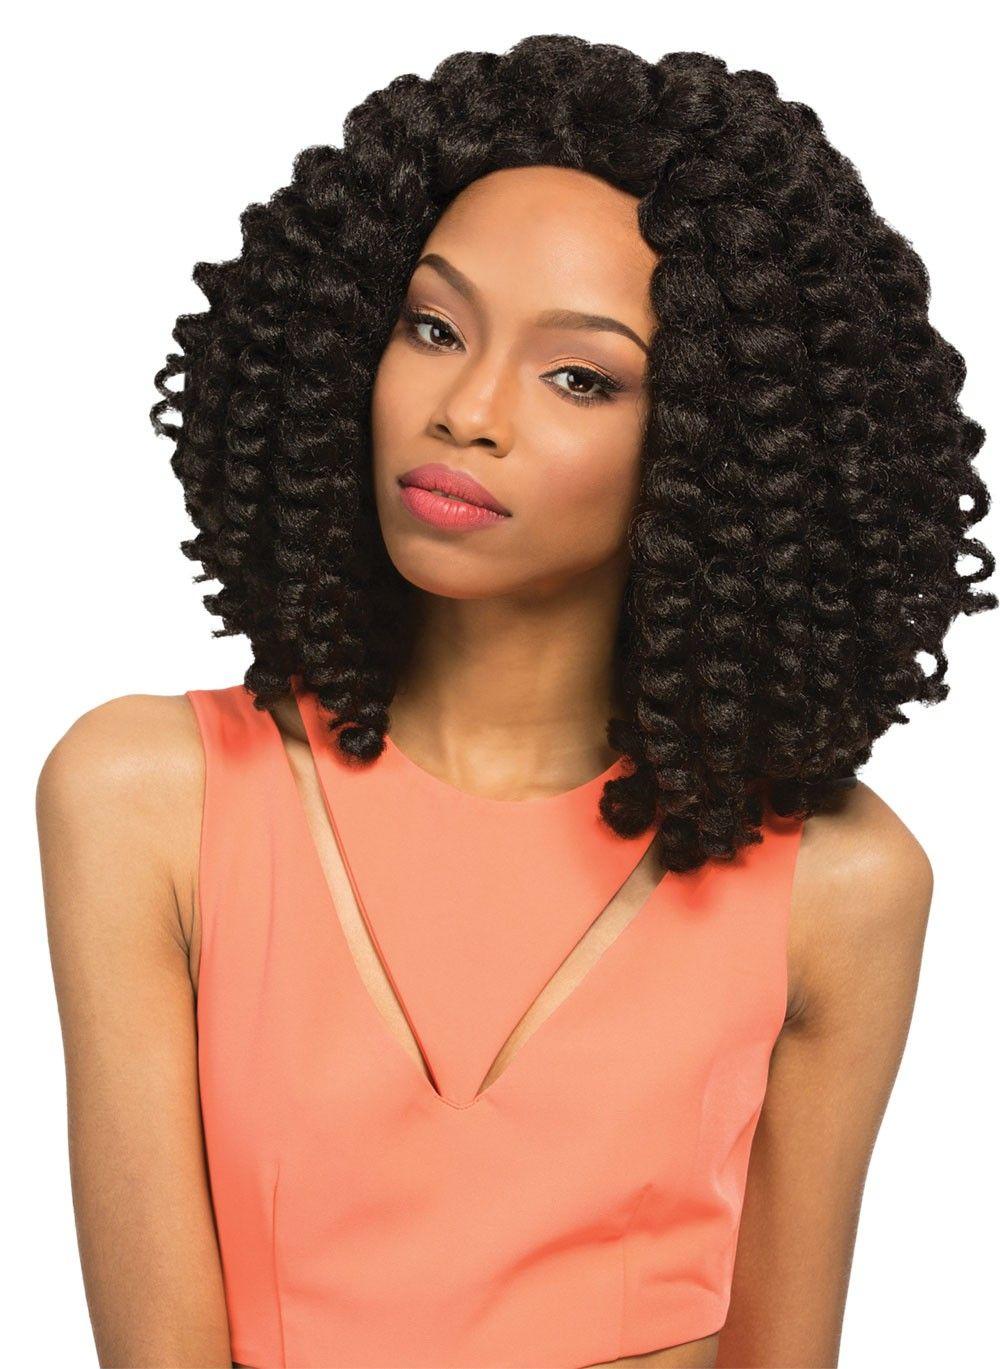 Outre X Pression Crochet Braid Cuevana Bounce Cool Braid Hairstyles Braided Hairstyles Wand Curl Crochet Hair